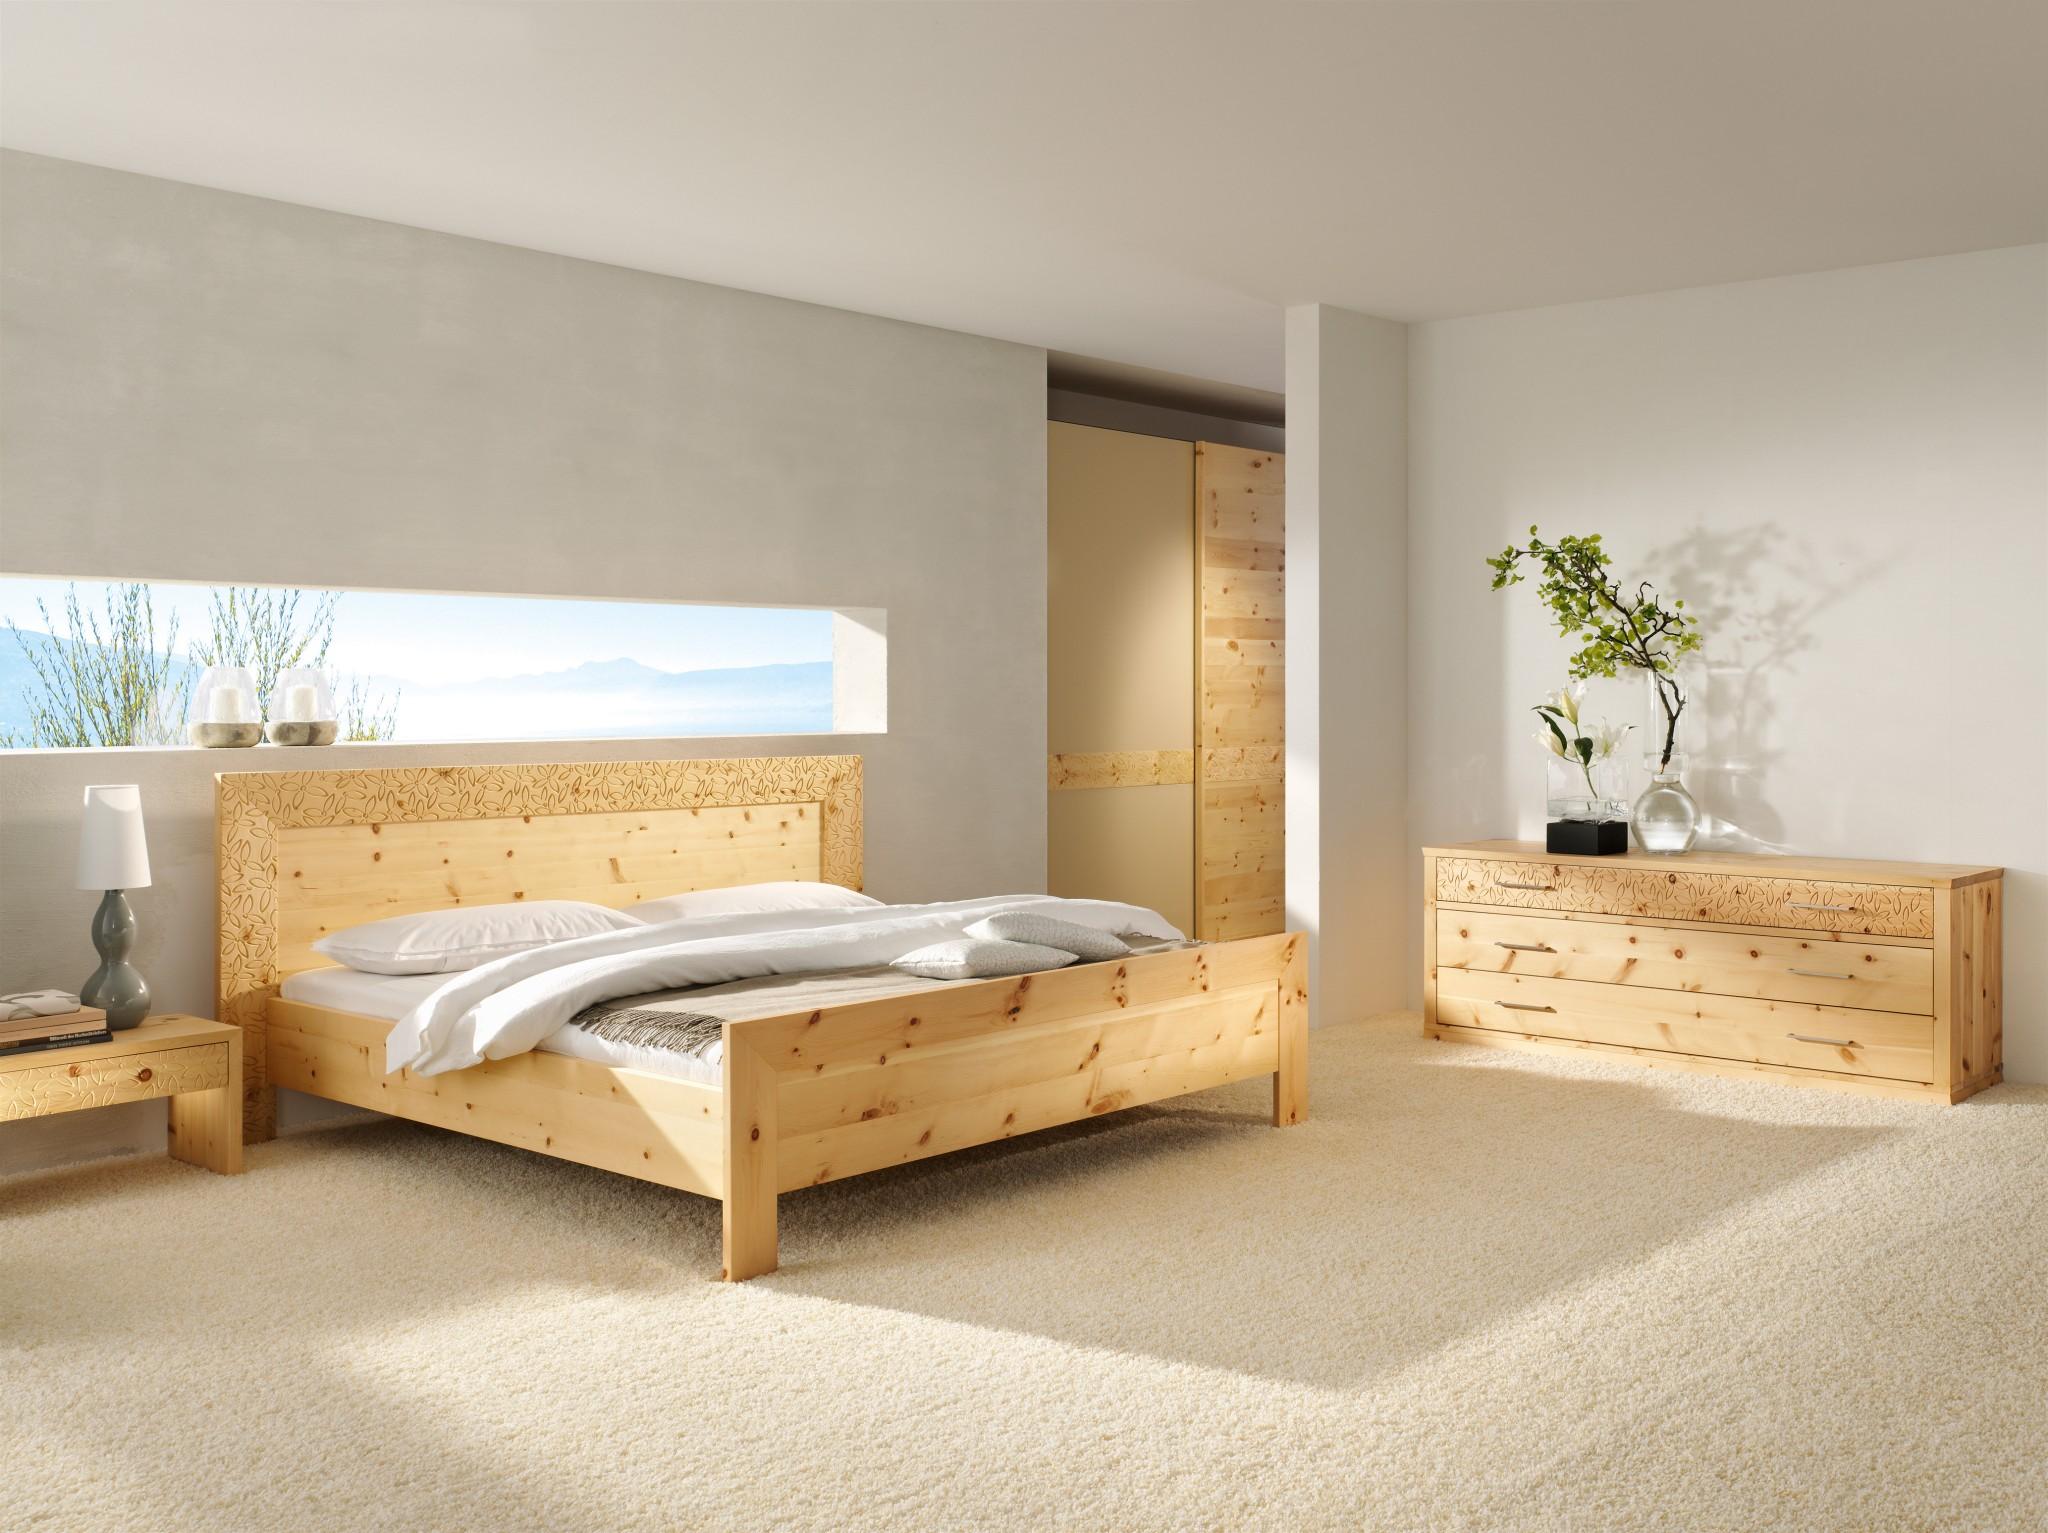 massivholz zirbenbett tares inkl 2 nachtk stchen in oberfl che roh ge lt oder lackiert. Black Bedroom Furniture Sets. Home Design Ideas